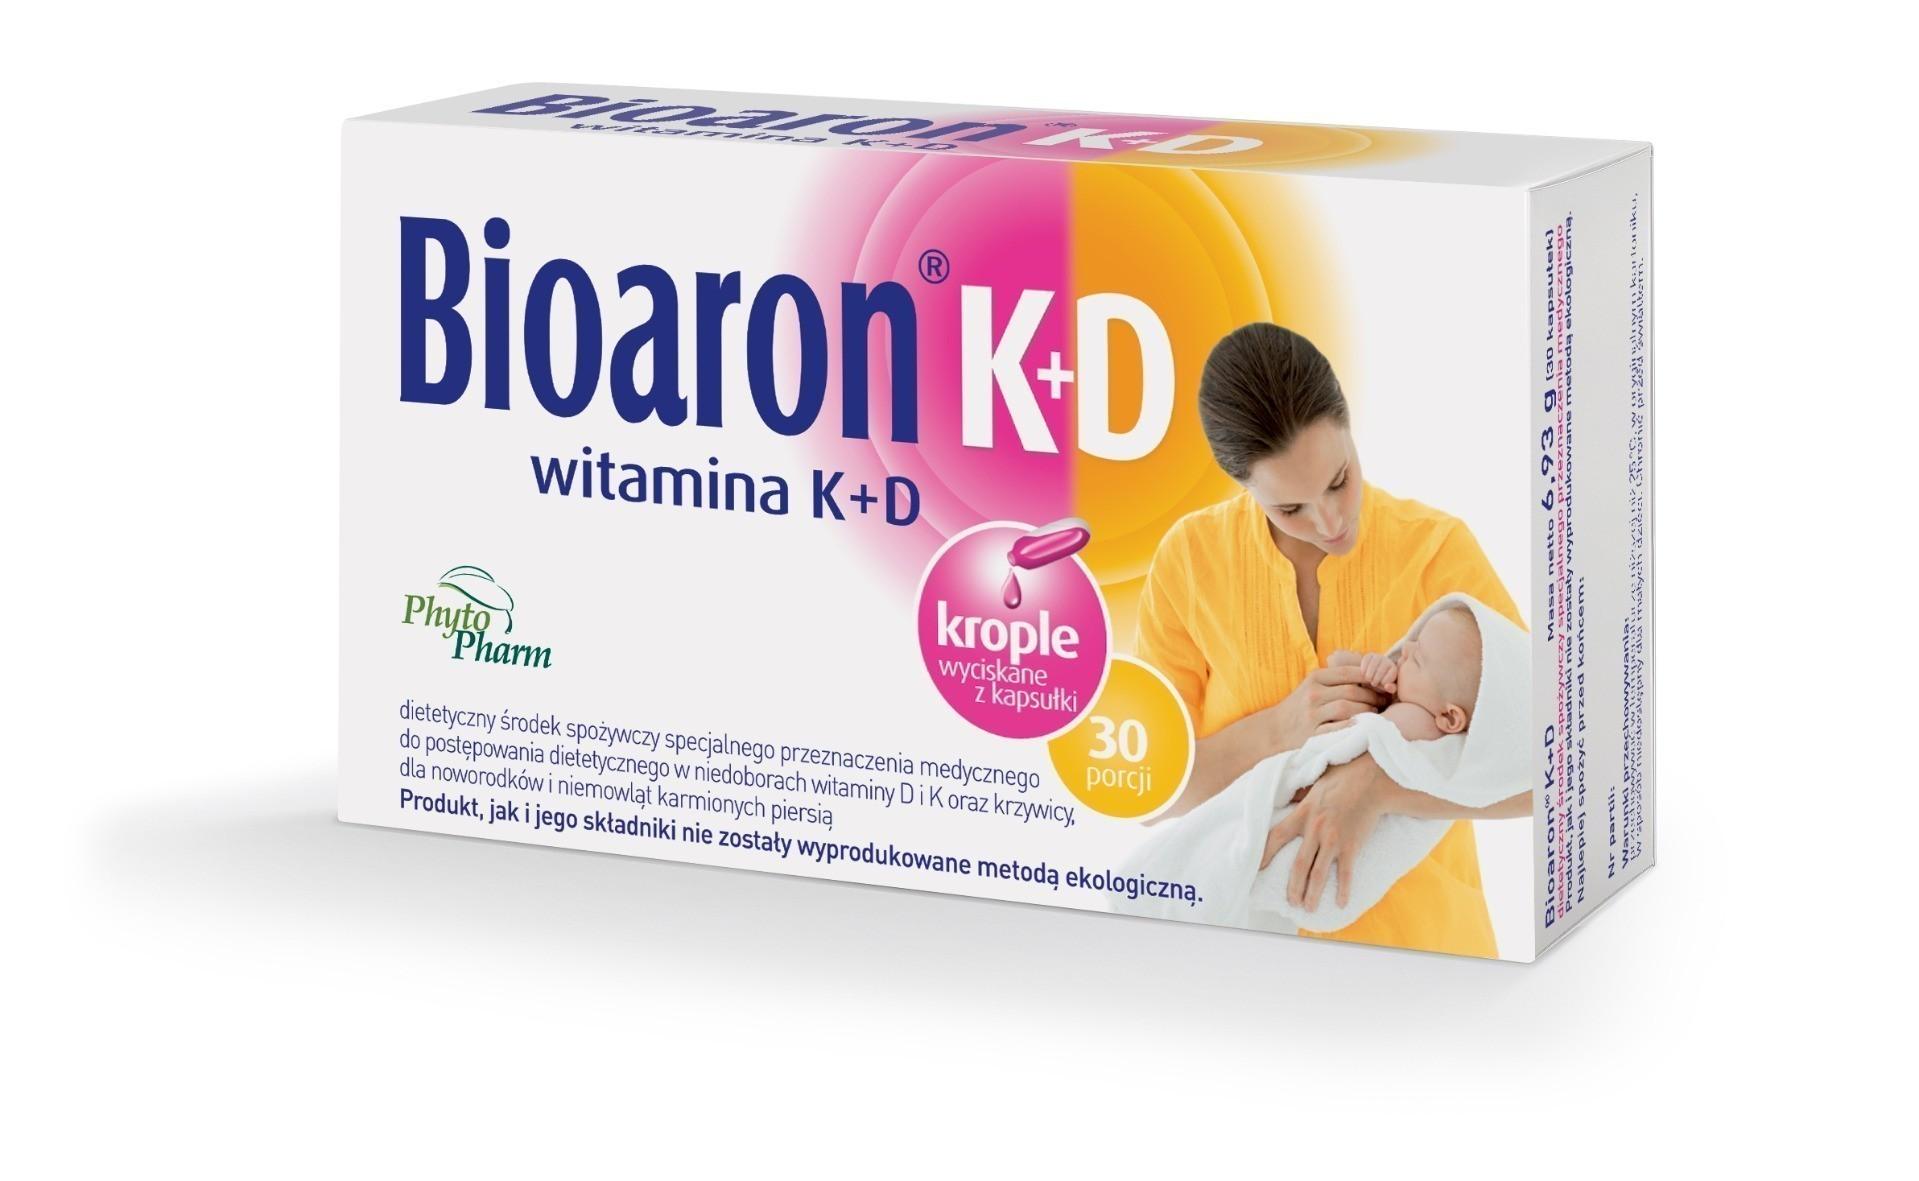 Bioaron Witamina K+D